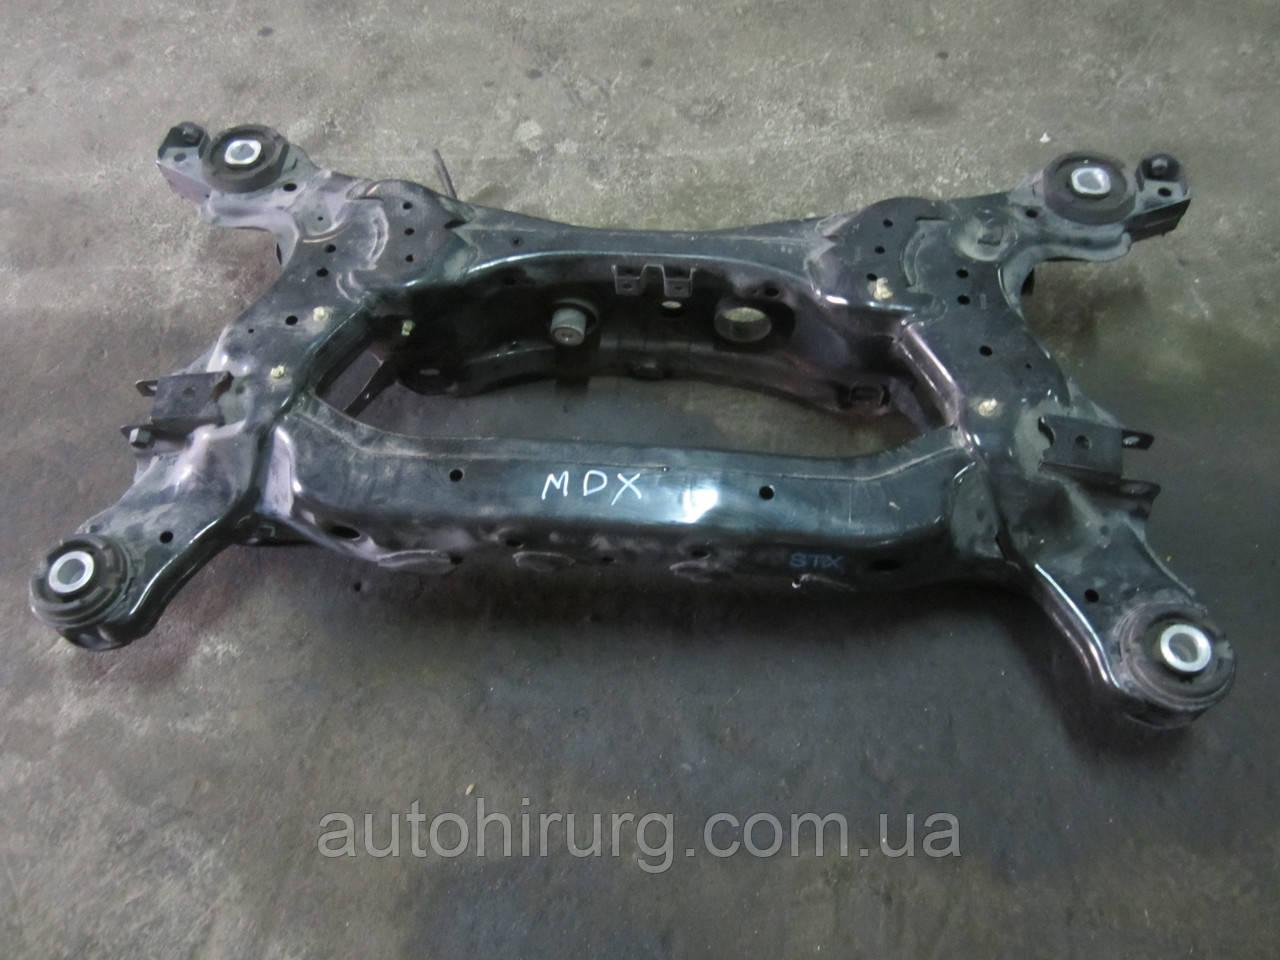 Задний подрамник Acura MDX, фото 1